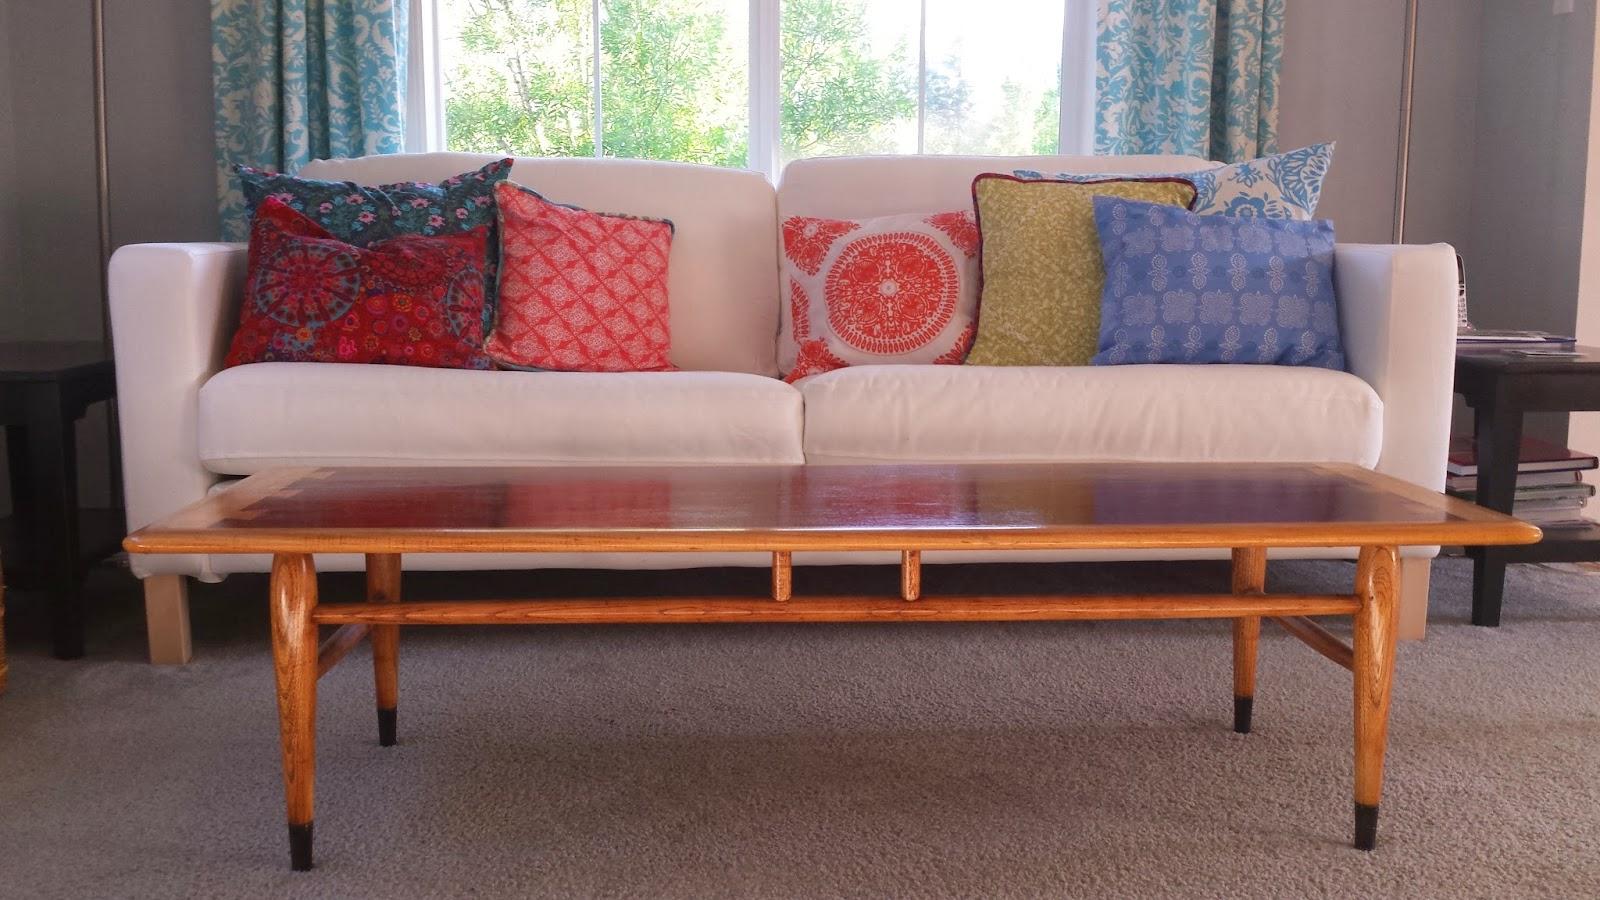 seven ways simple ikea karlstad sofa makes it home. Black Bedroom Furniture Sets. Home Design Ideas